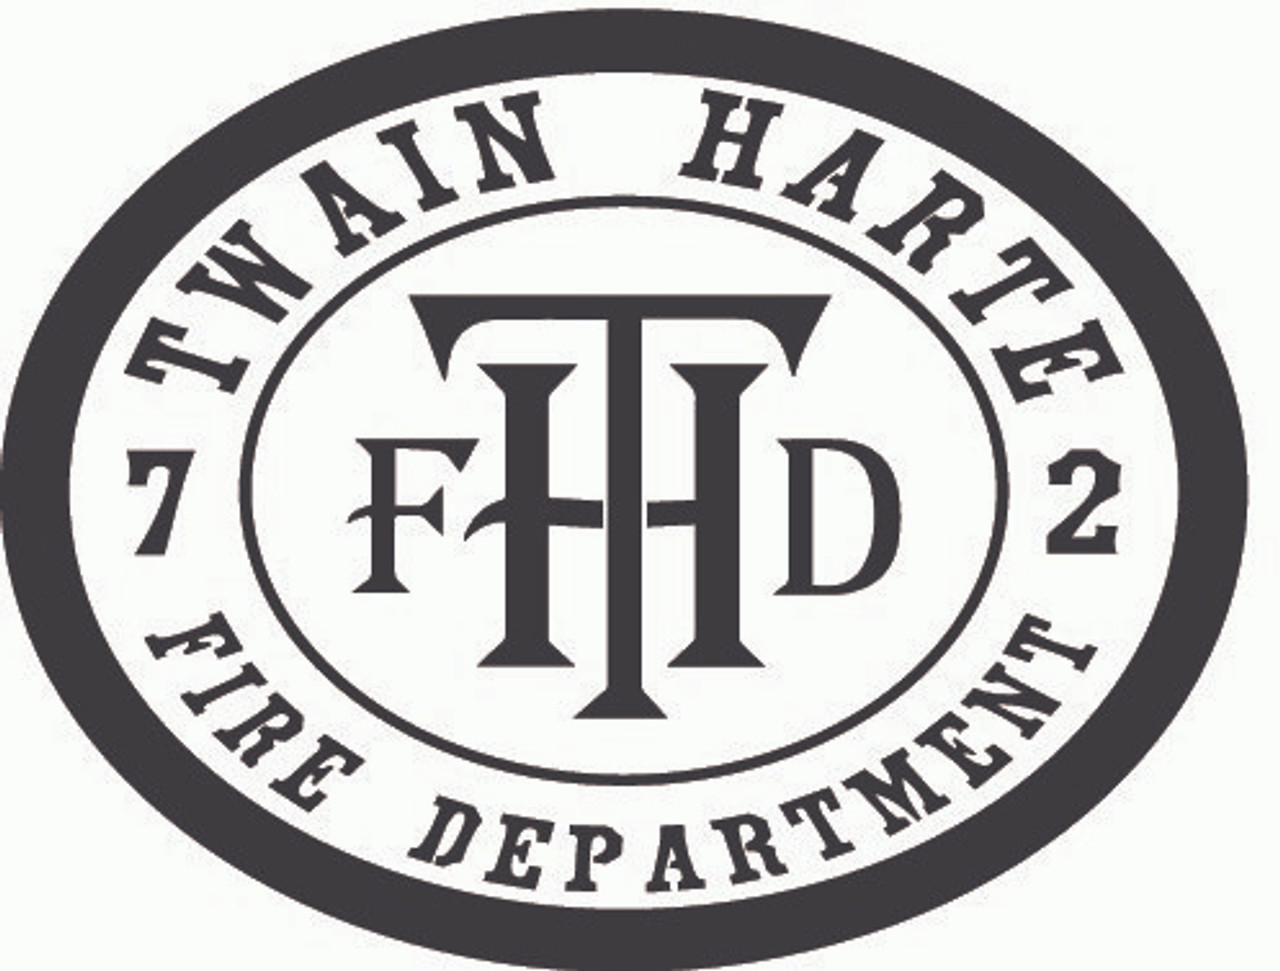 Twain Harte Fire Department Buckle (RESTRICTED)